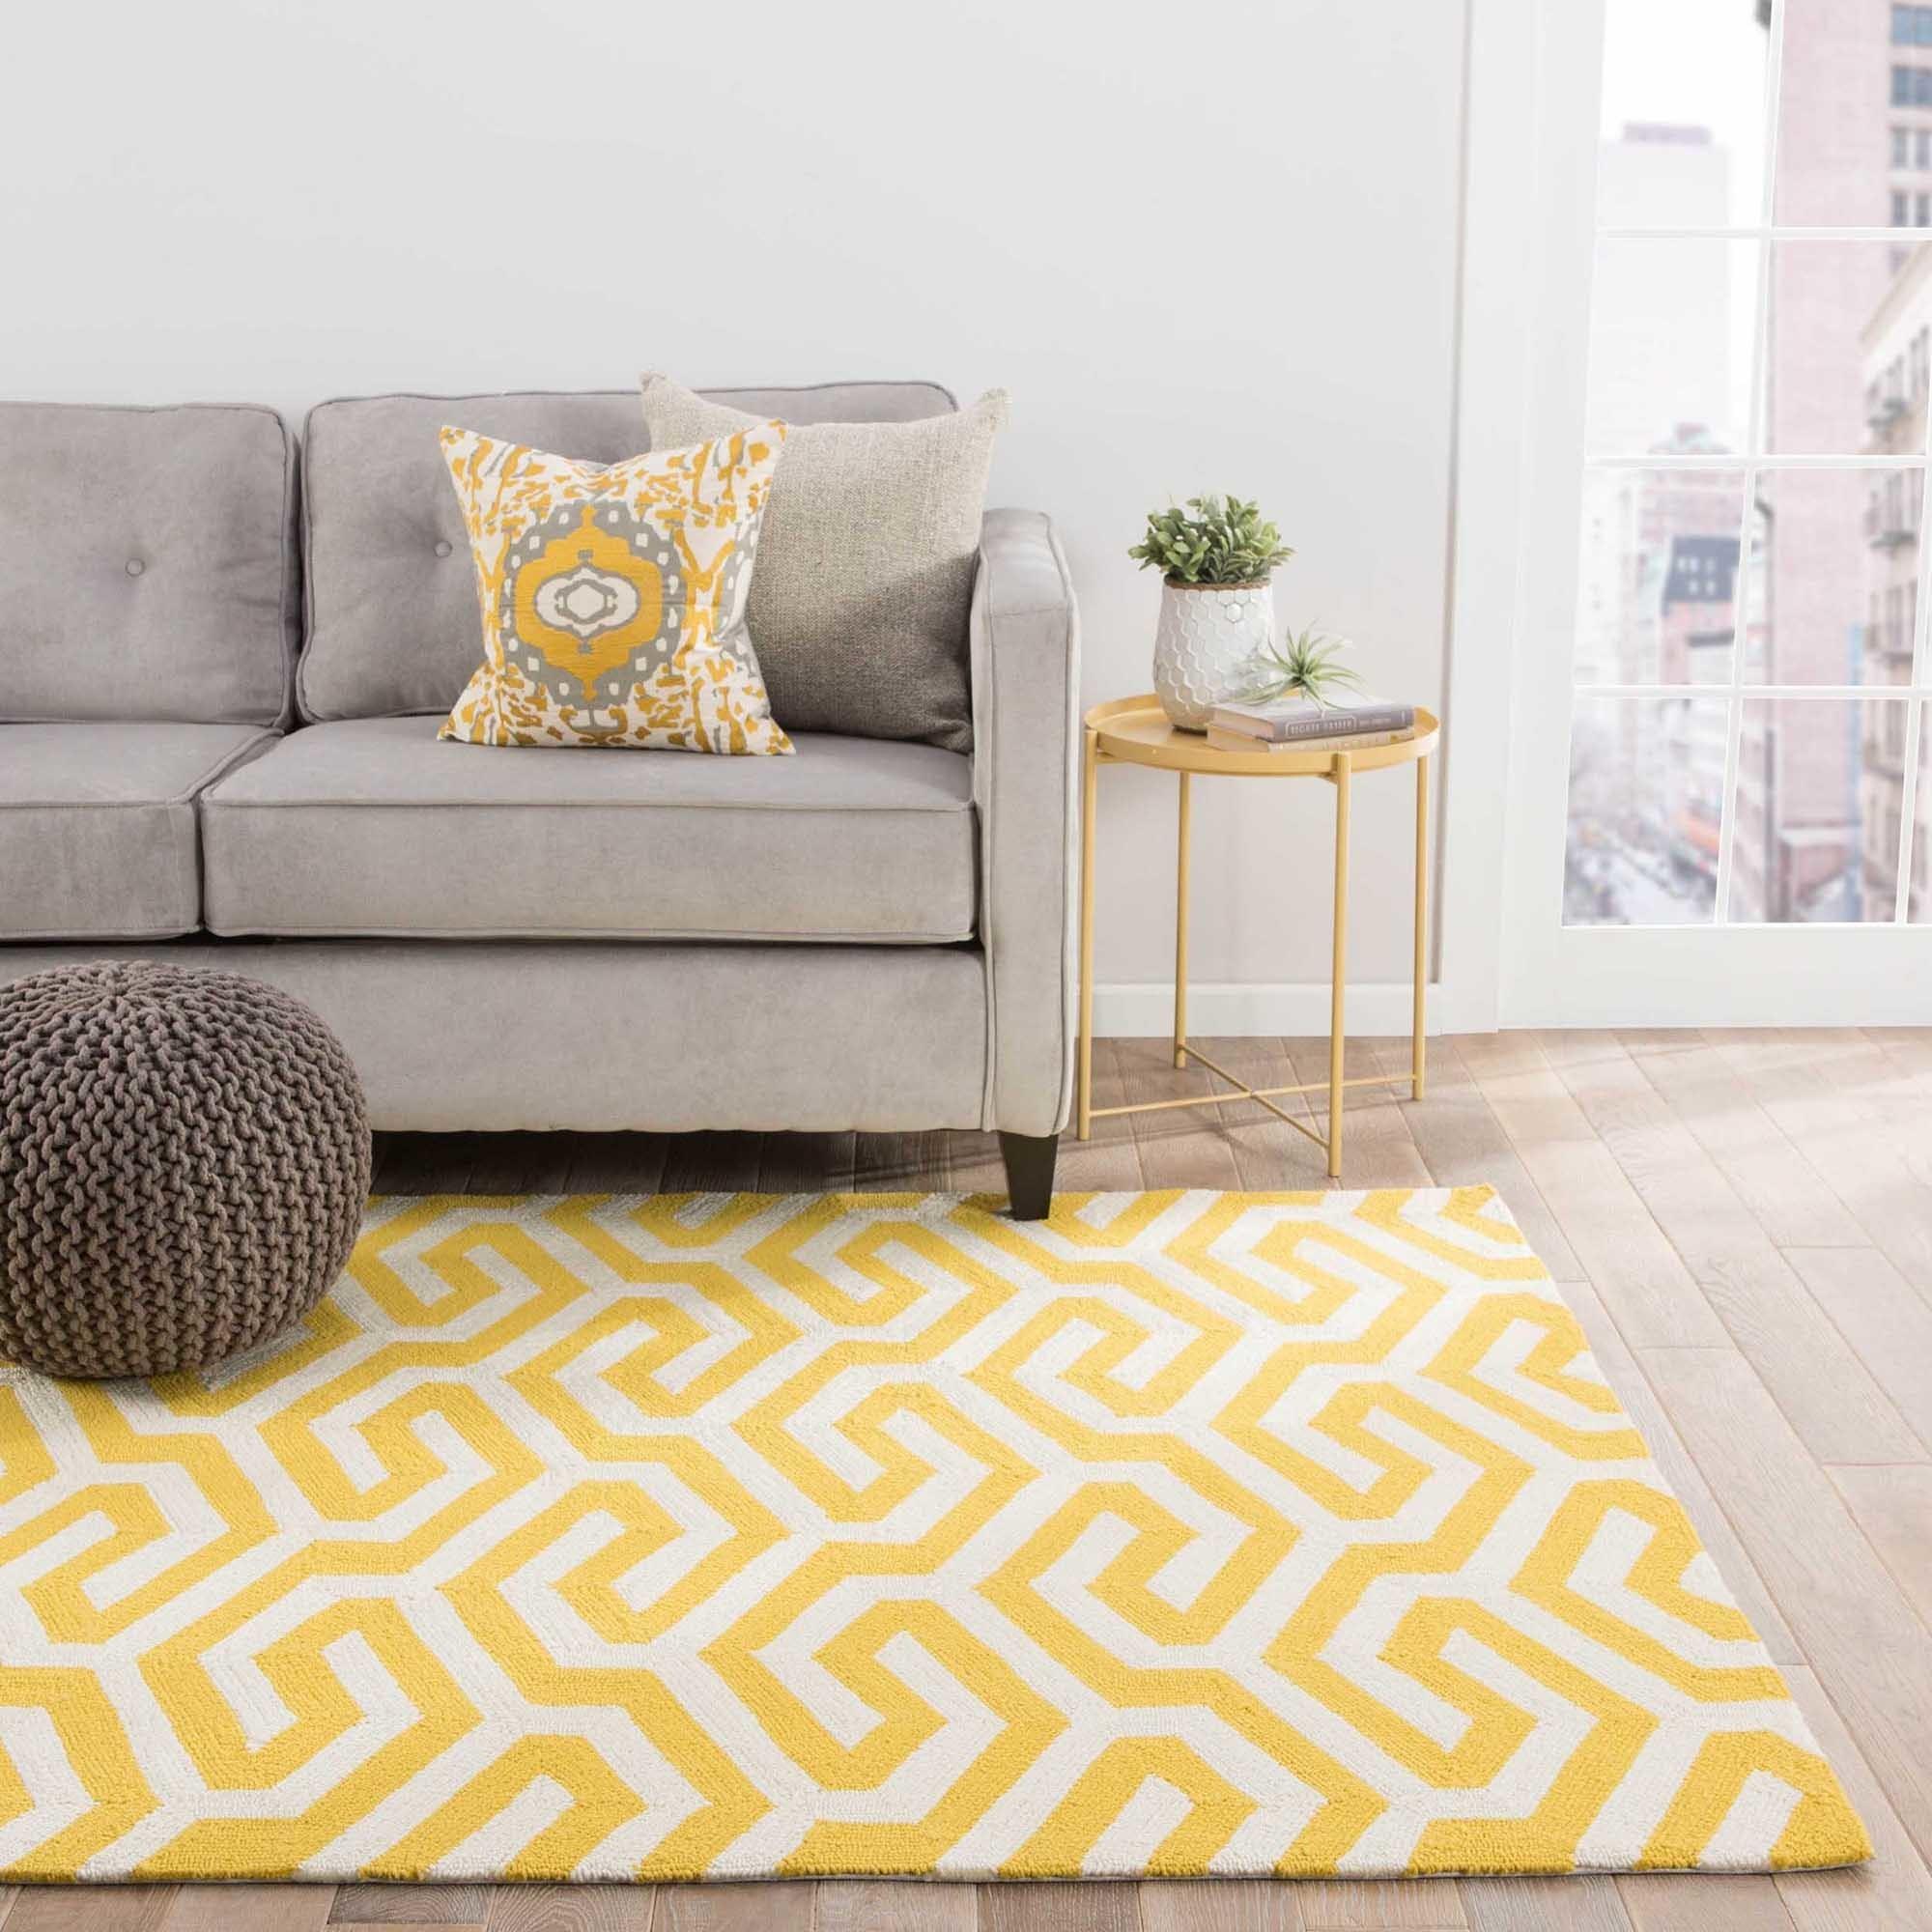 Casselton Indoor Outdoor Geometric Yellow White Area Rug 5 X 7 6 5 X 8 Surplus Overstock 12088879